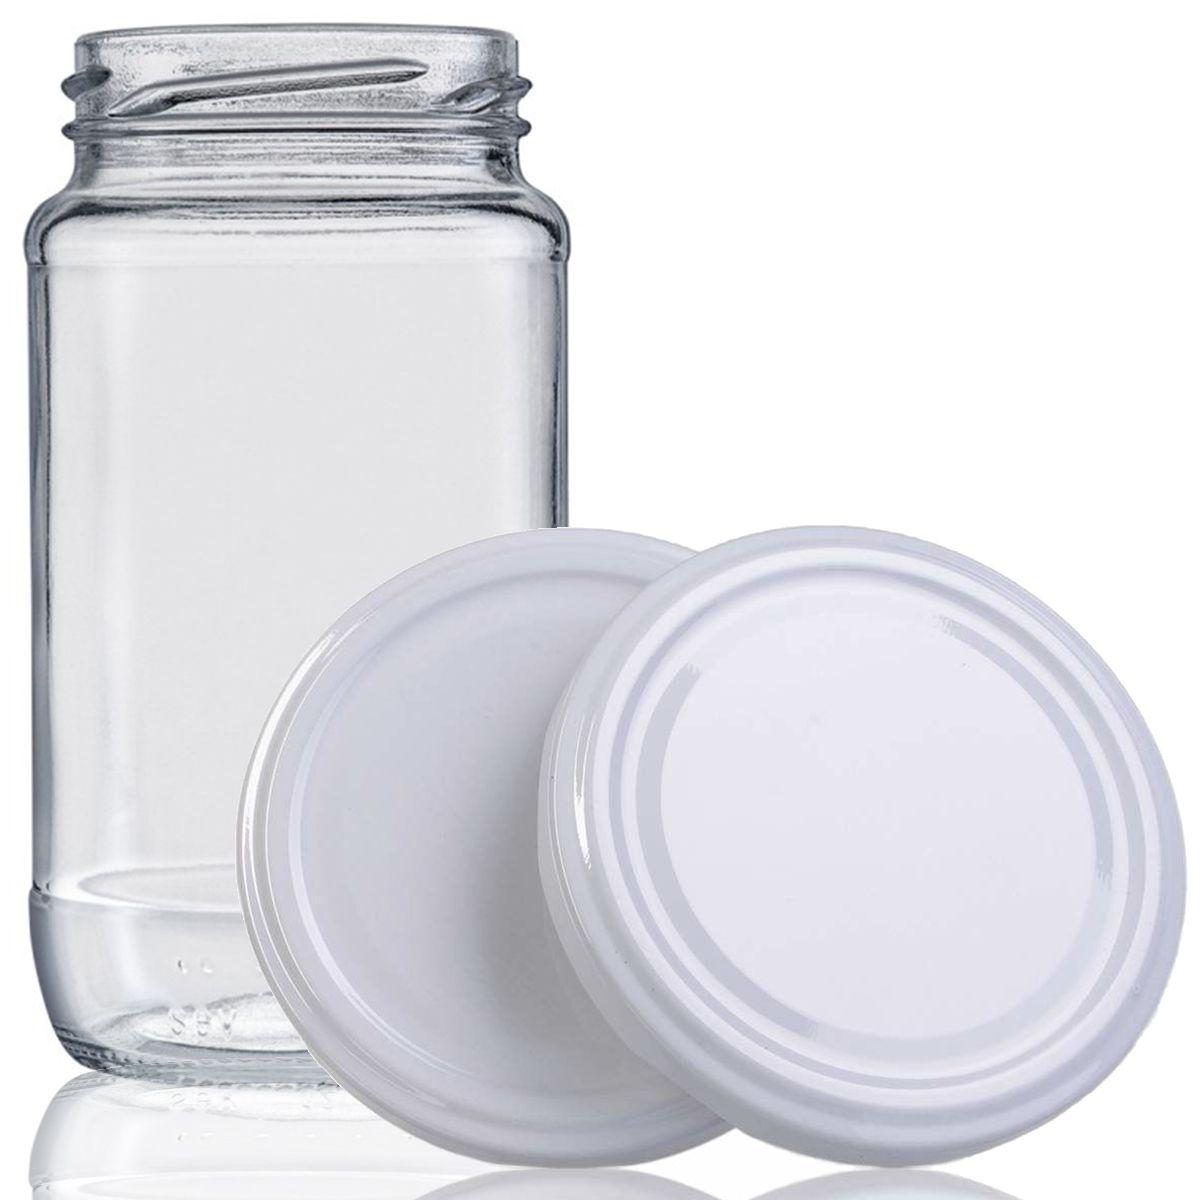 48 Potes De Vidro Azeitona 355 Ml Com Tampa Branca + Lacre  - EMPÓRIO PACK